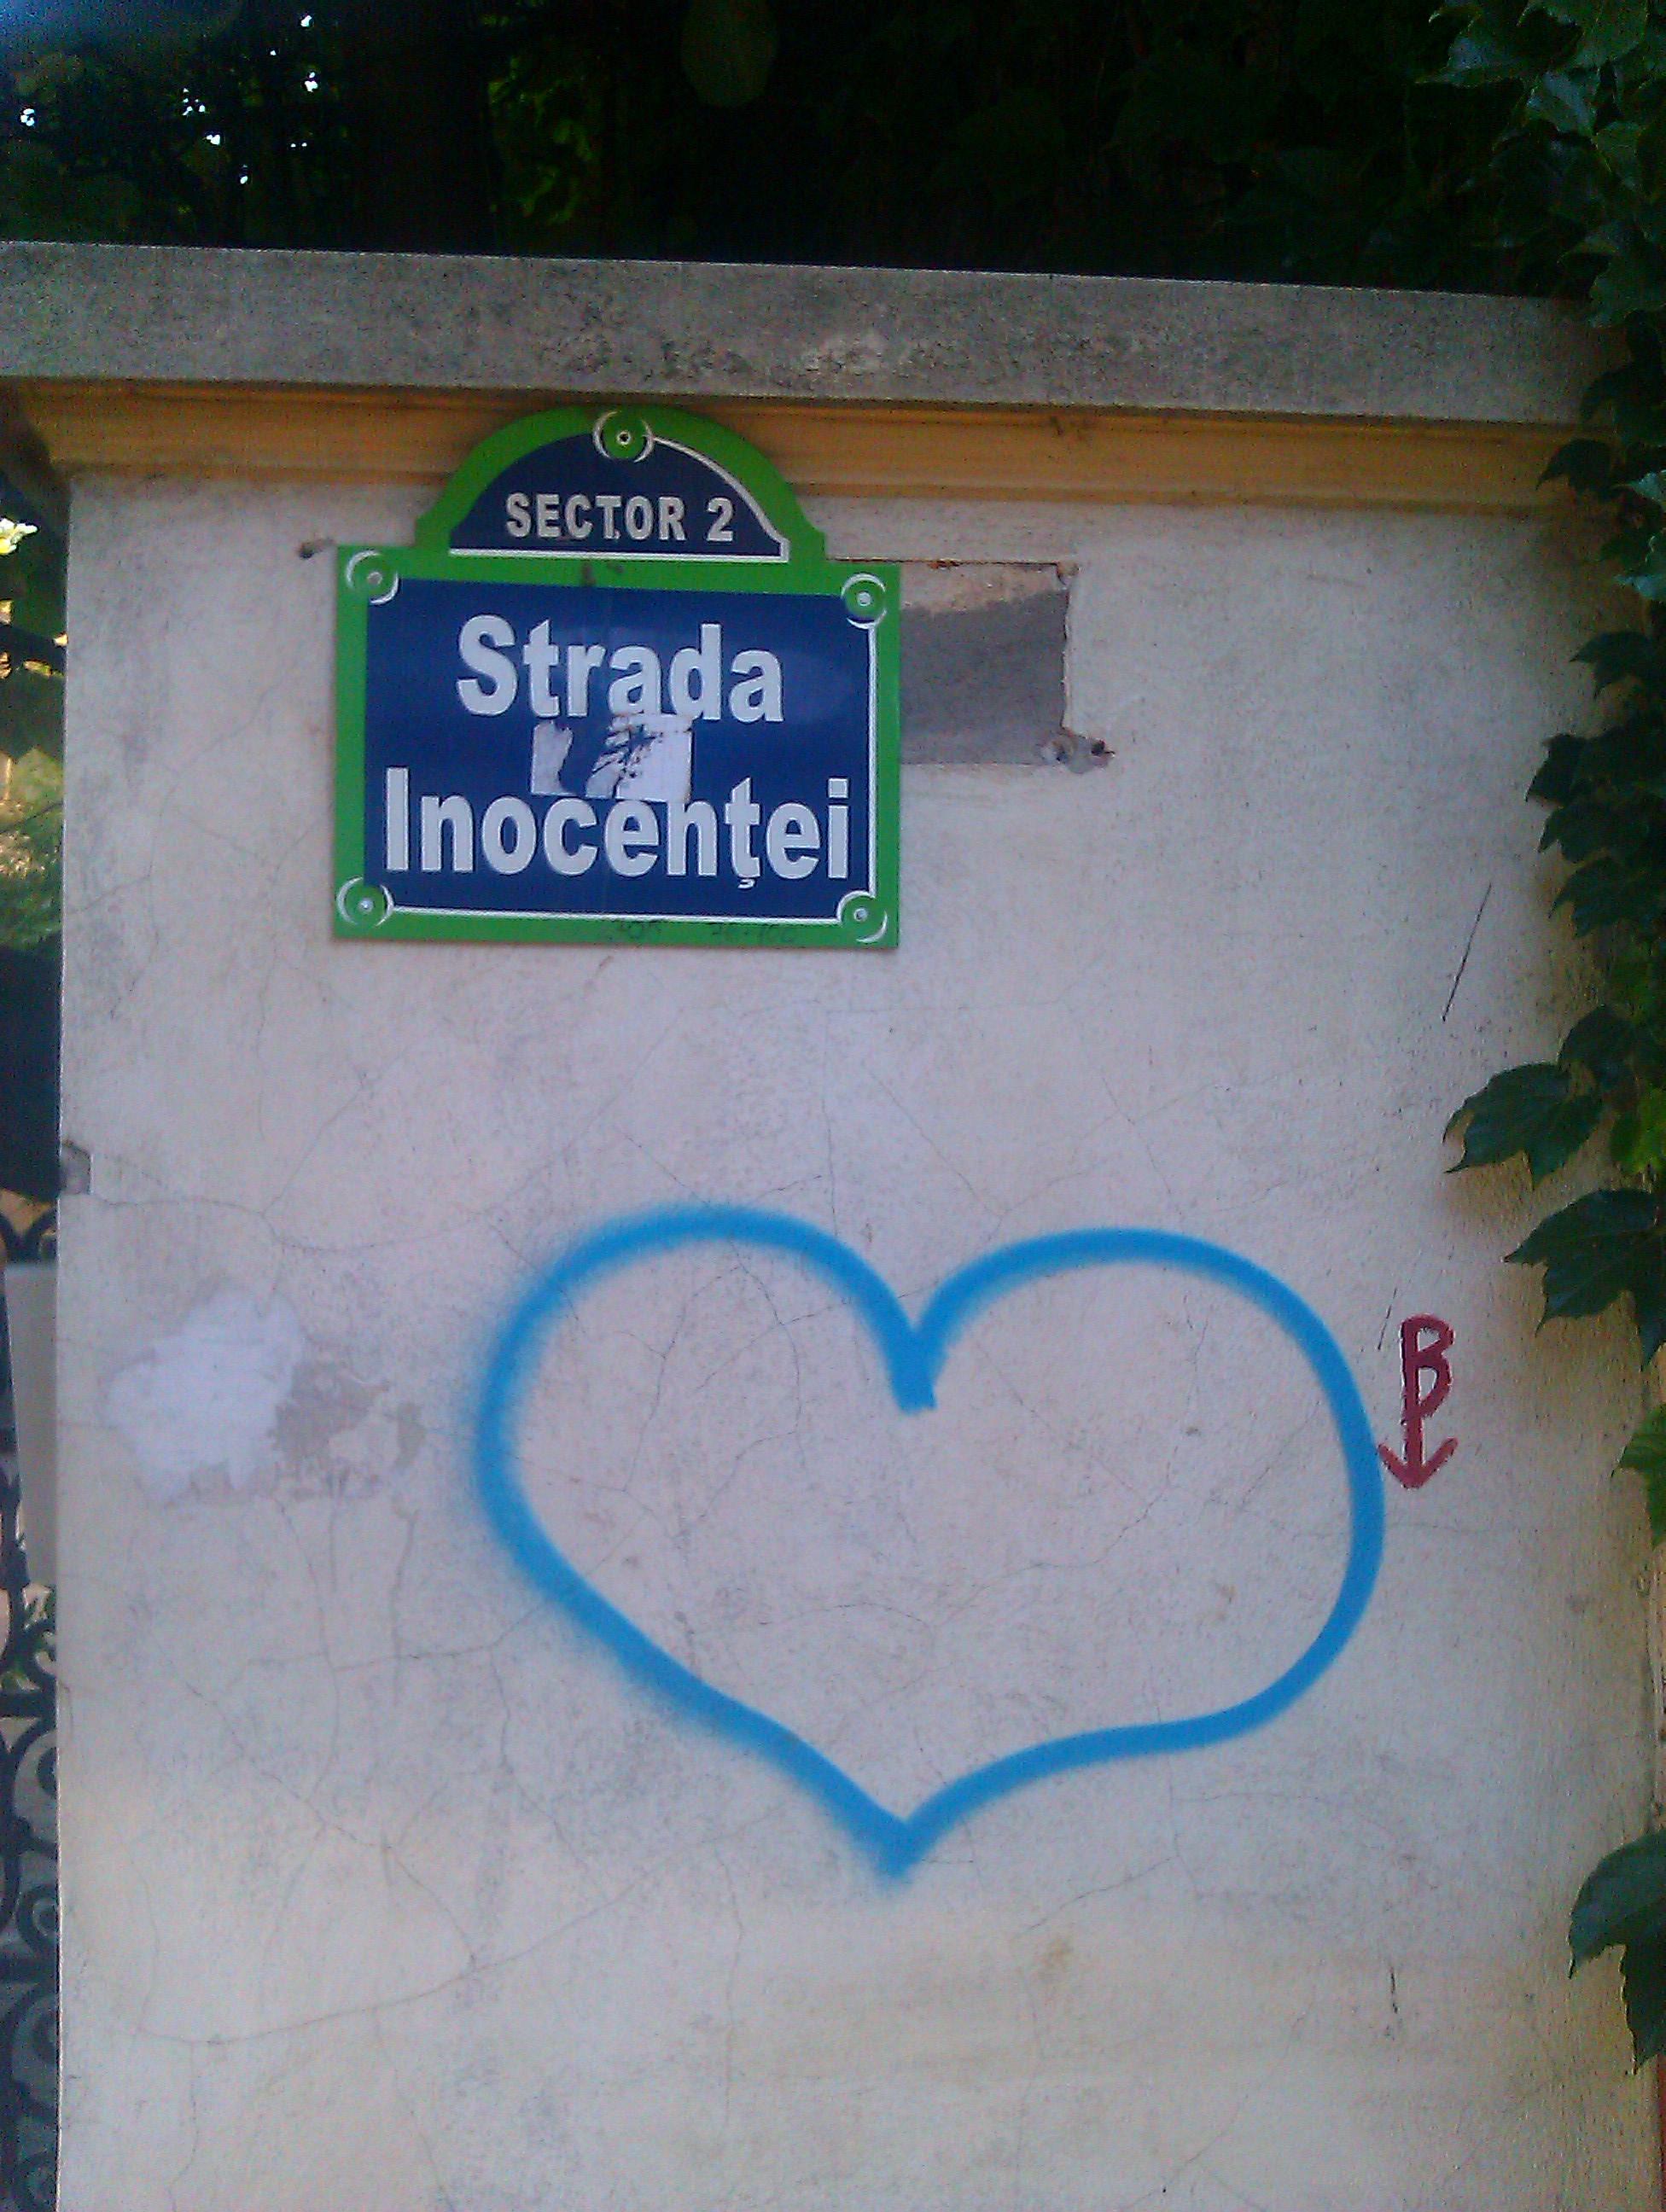 I <3 Bucuresti: Strazi cu nume amuzante si interesante